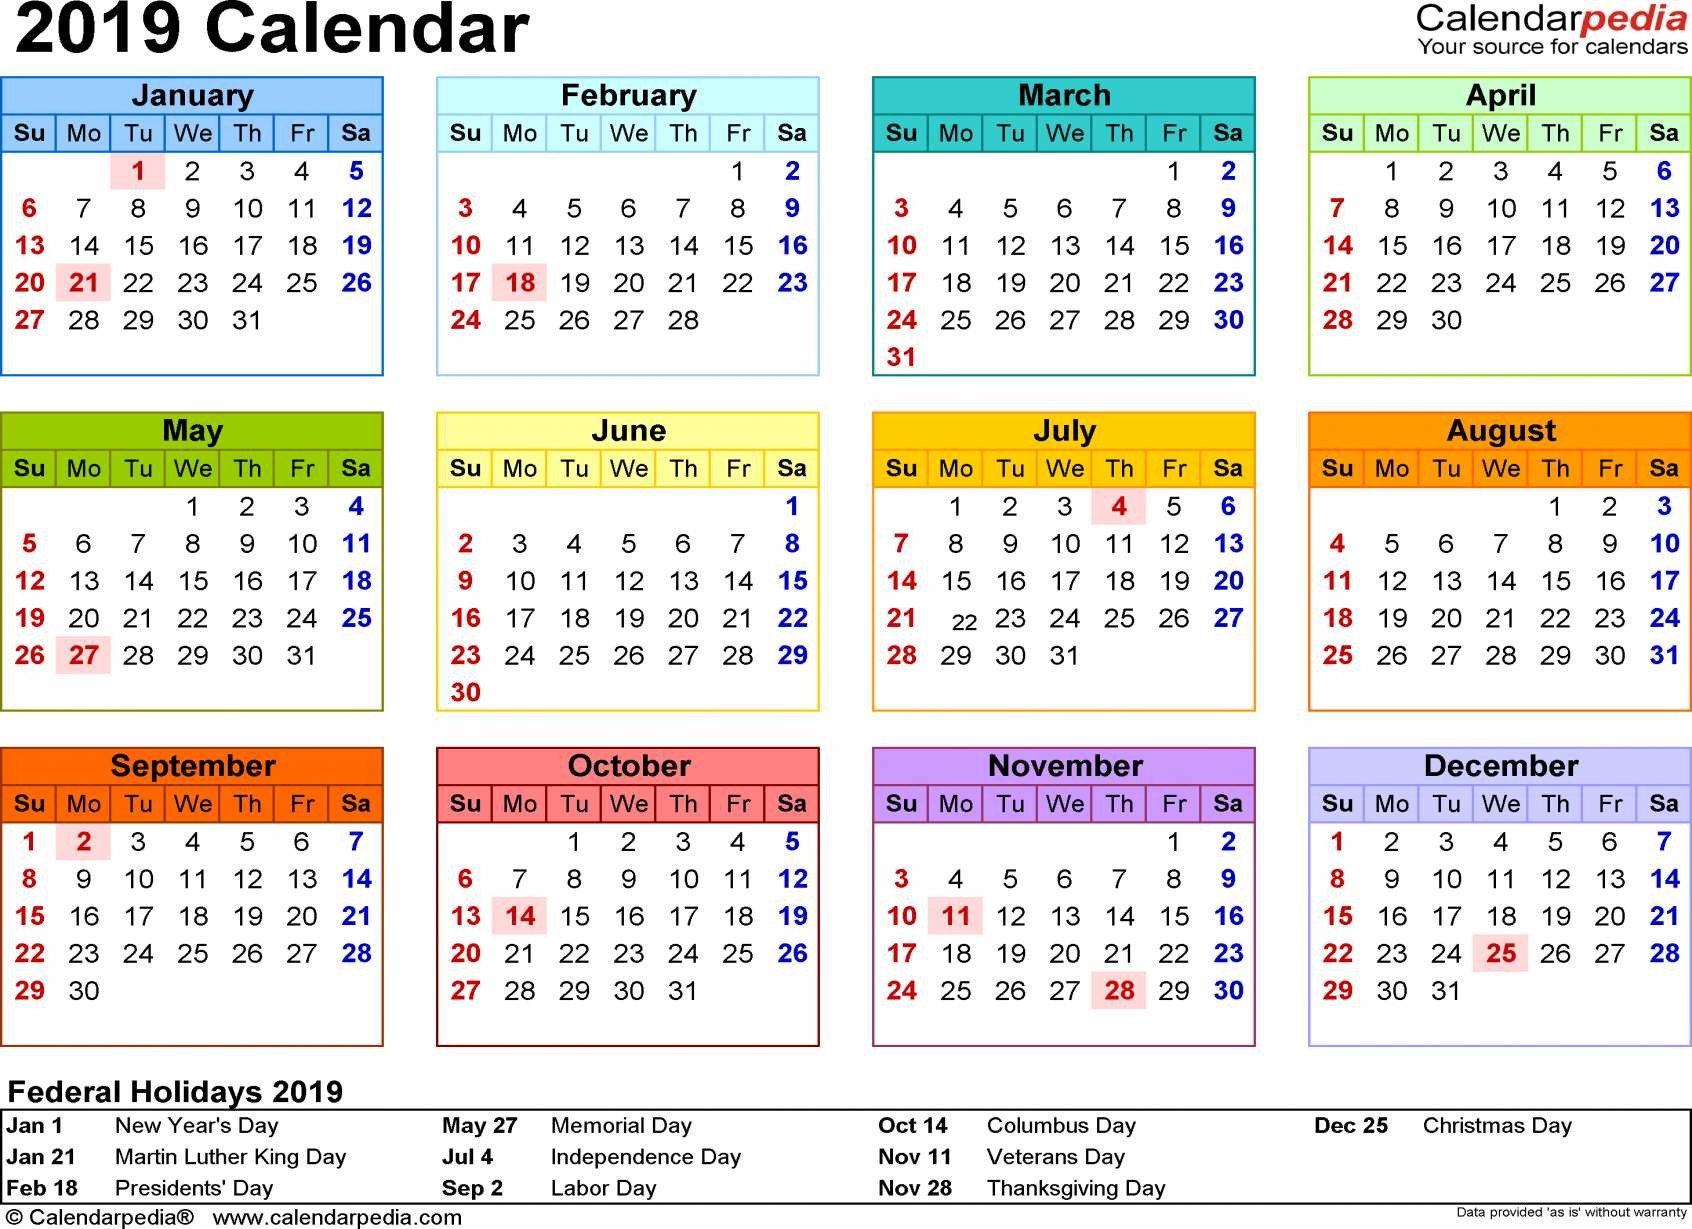 March Calendar Calligraphy Más Recientes Calendar Timeline Template Excel Djstevenice Of March Calendar Calligraphy Más Recientes 007 Blank Calendar Printable Template March Excel Uohrjx Tweyig Free